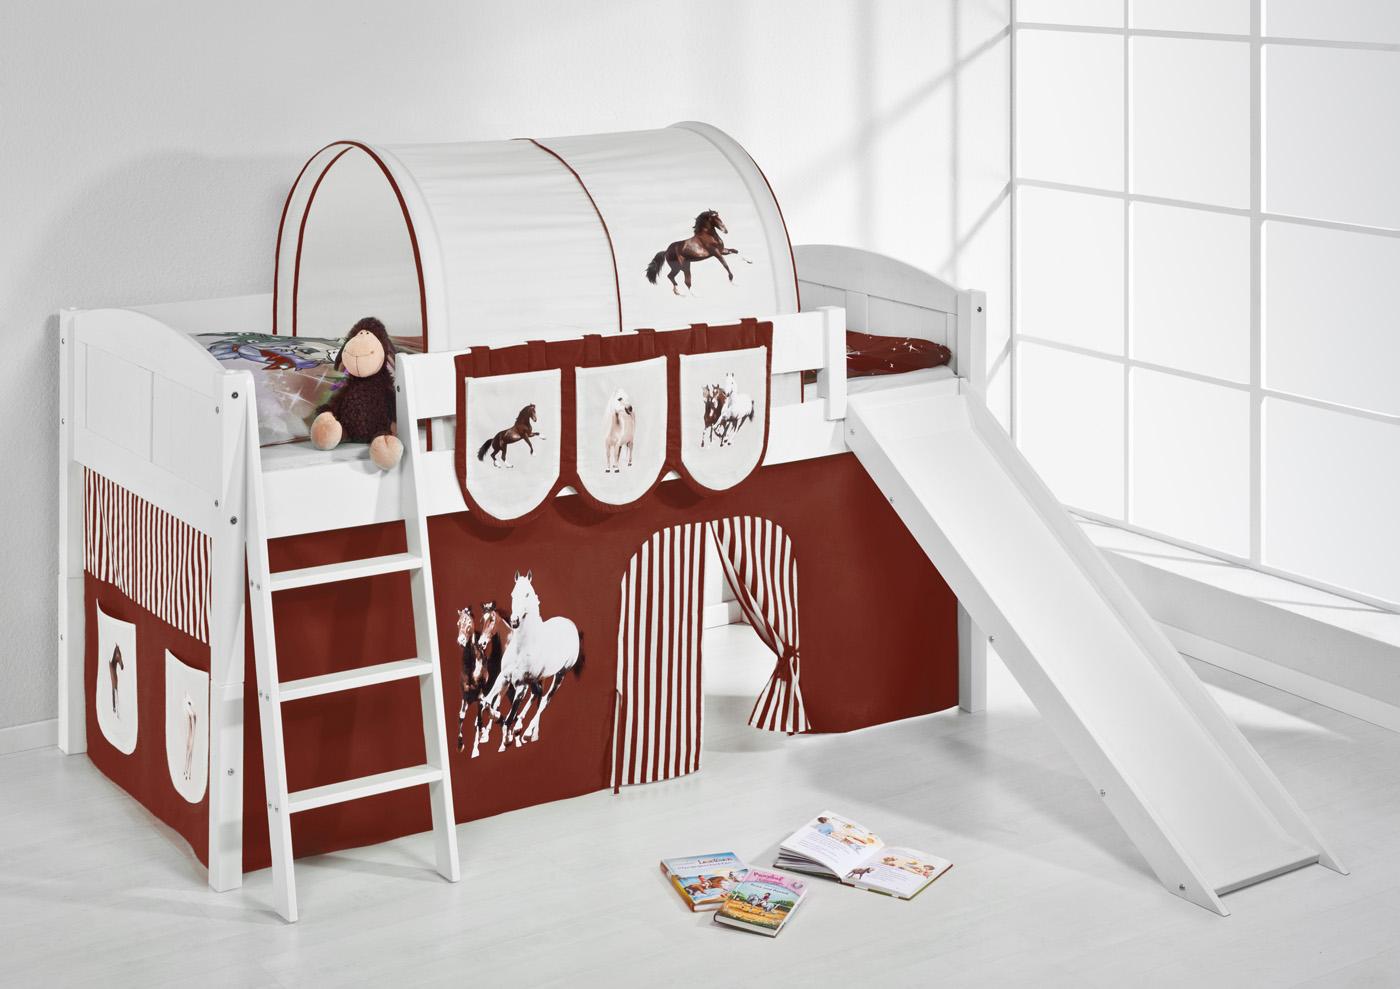 hochbett spielbett etagenbett massiv mit rutsche neu 4106. Black Bedroom Furniture Sets. Home Design Ideas